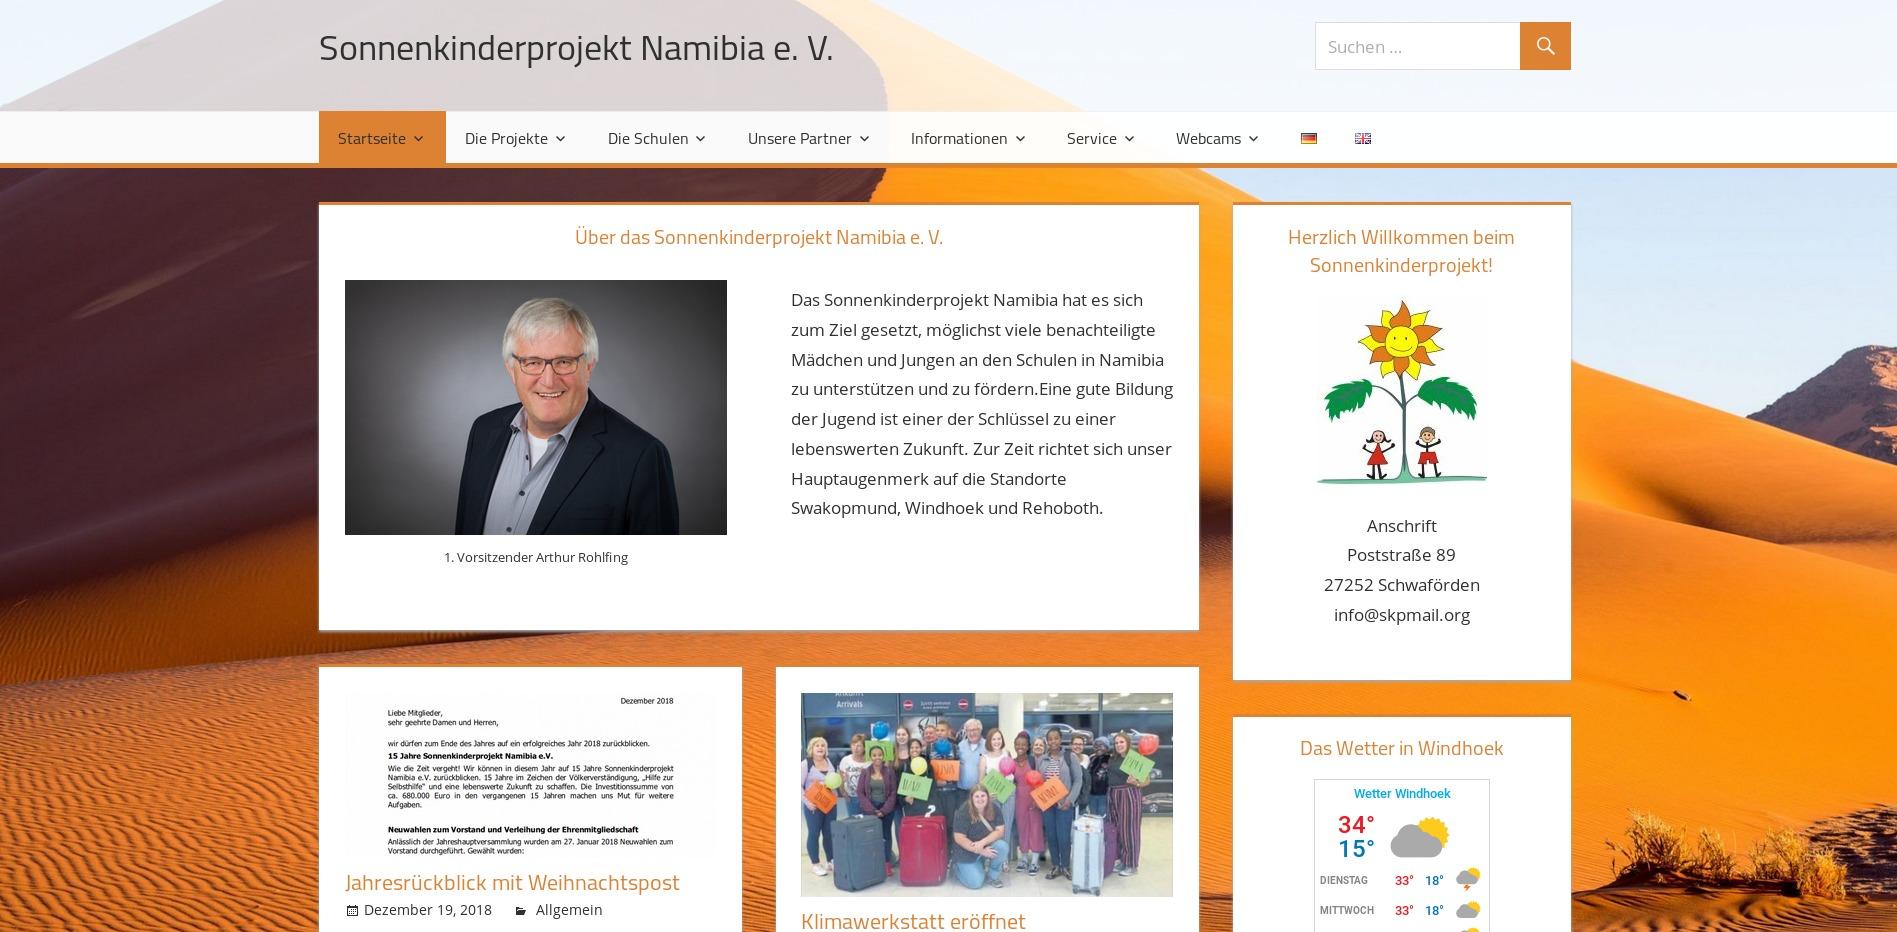 Sonnenkinderprojekt Webseite